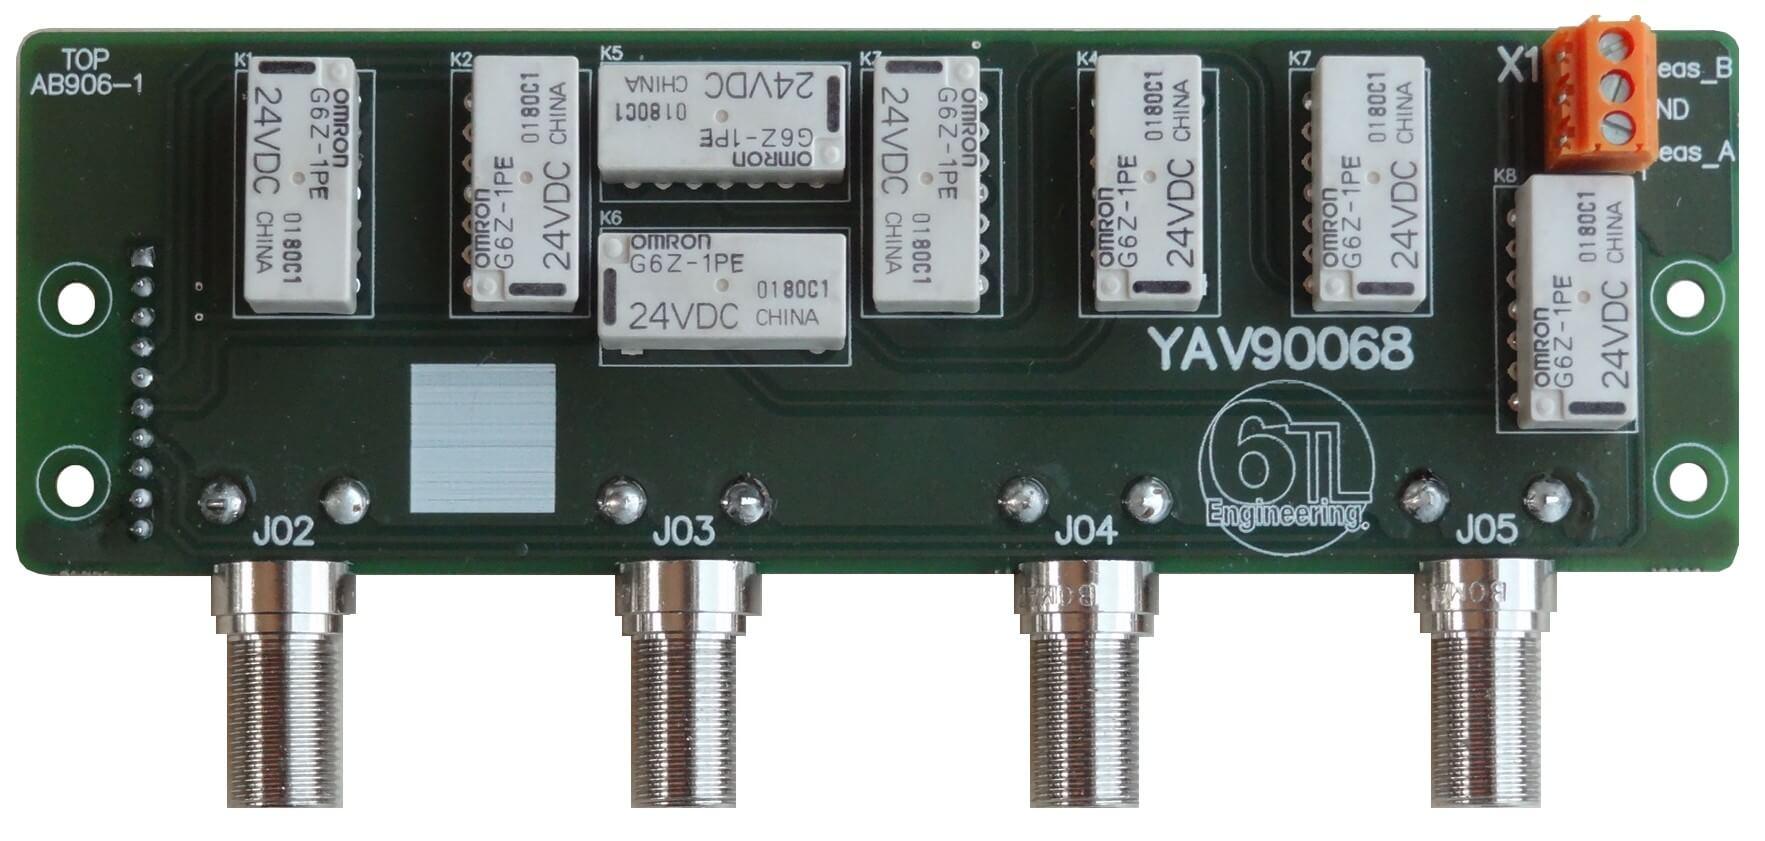 Satellite TV & HDMI Flex Modules - YAV90068